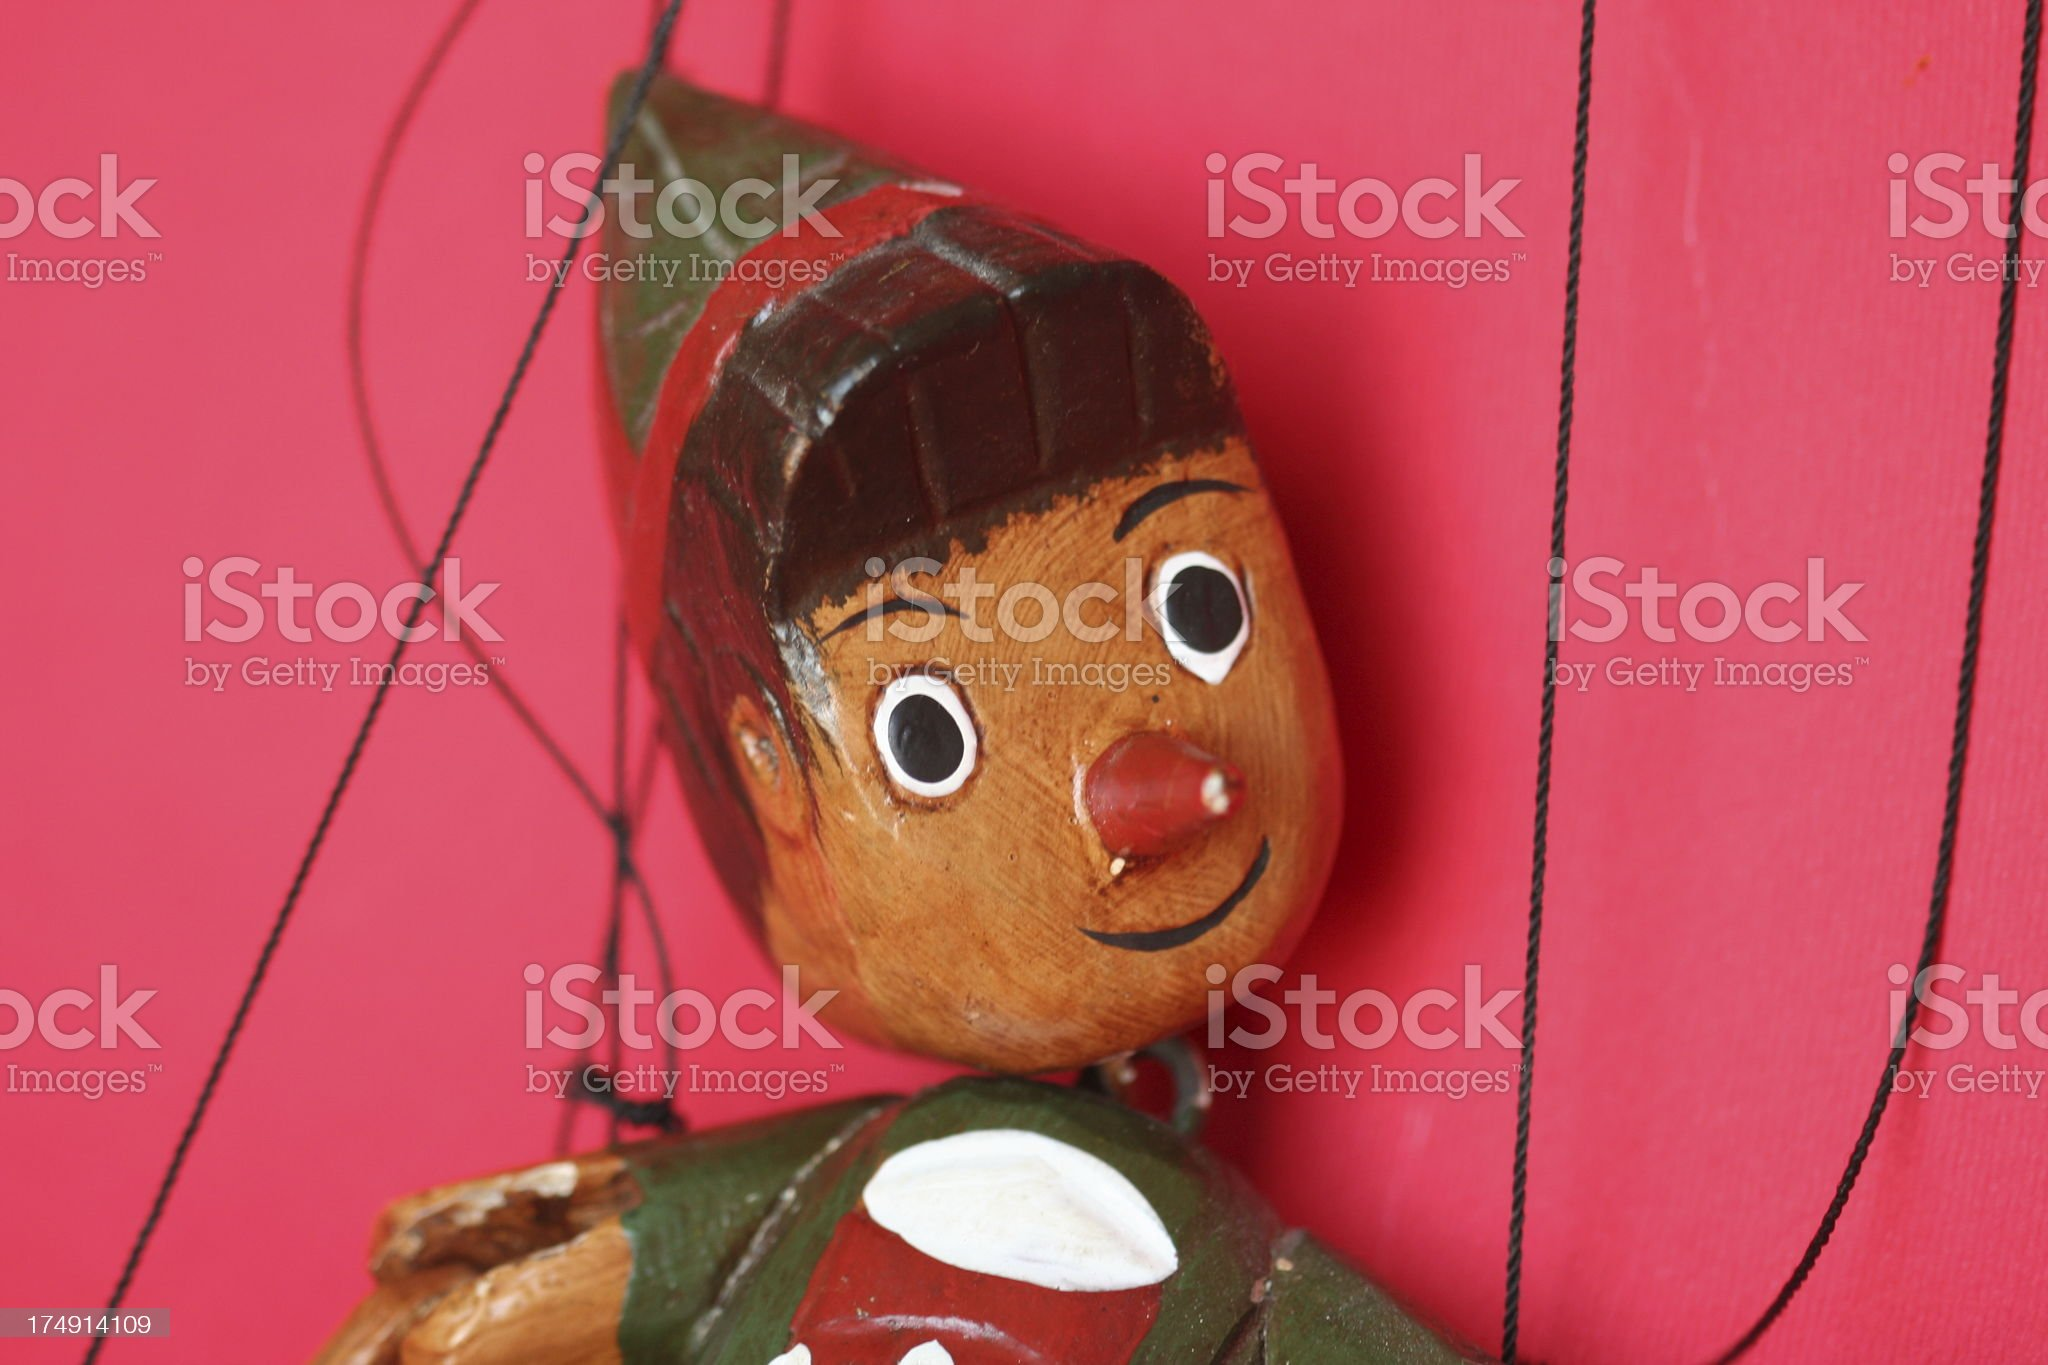 Pinocchio face royalty-free stock photo